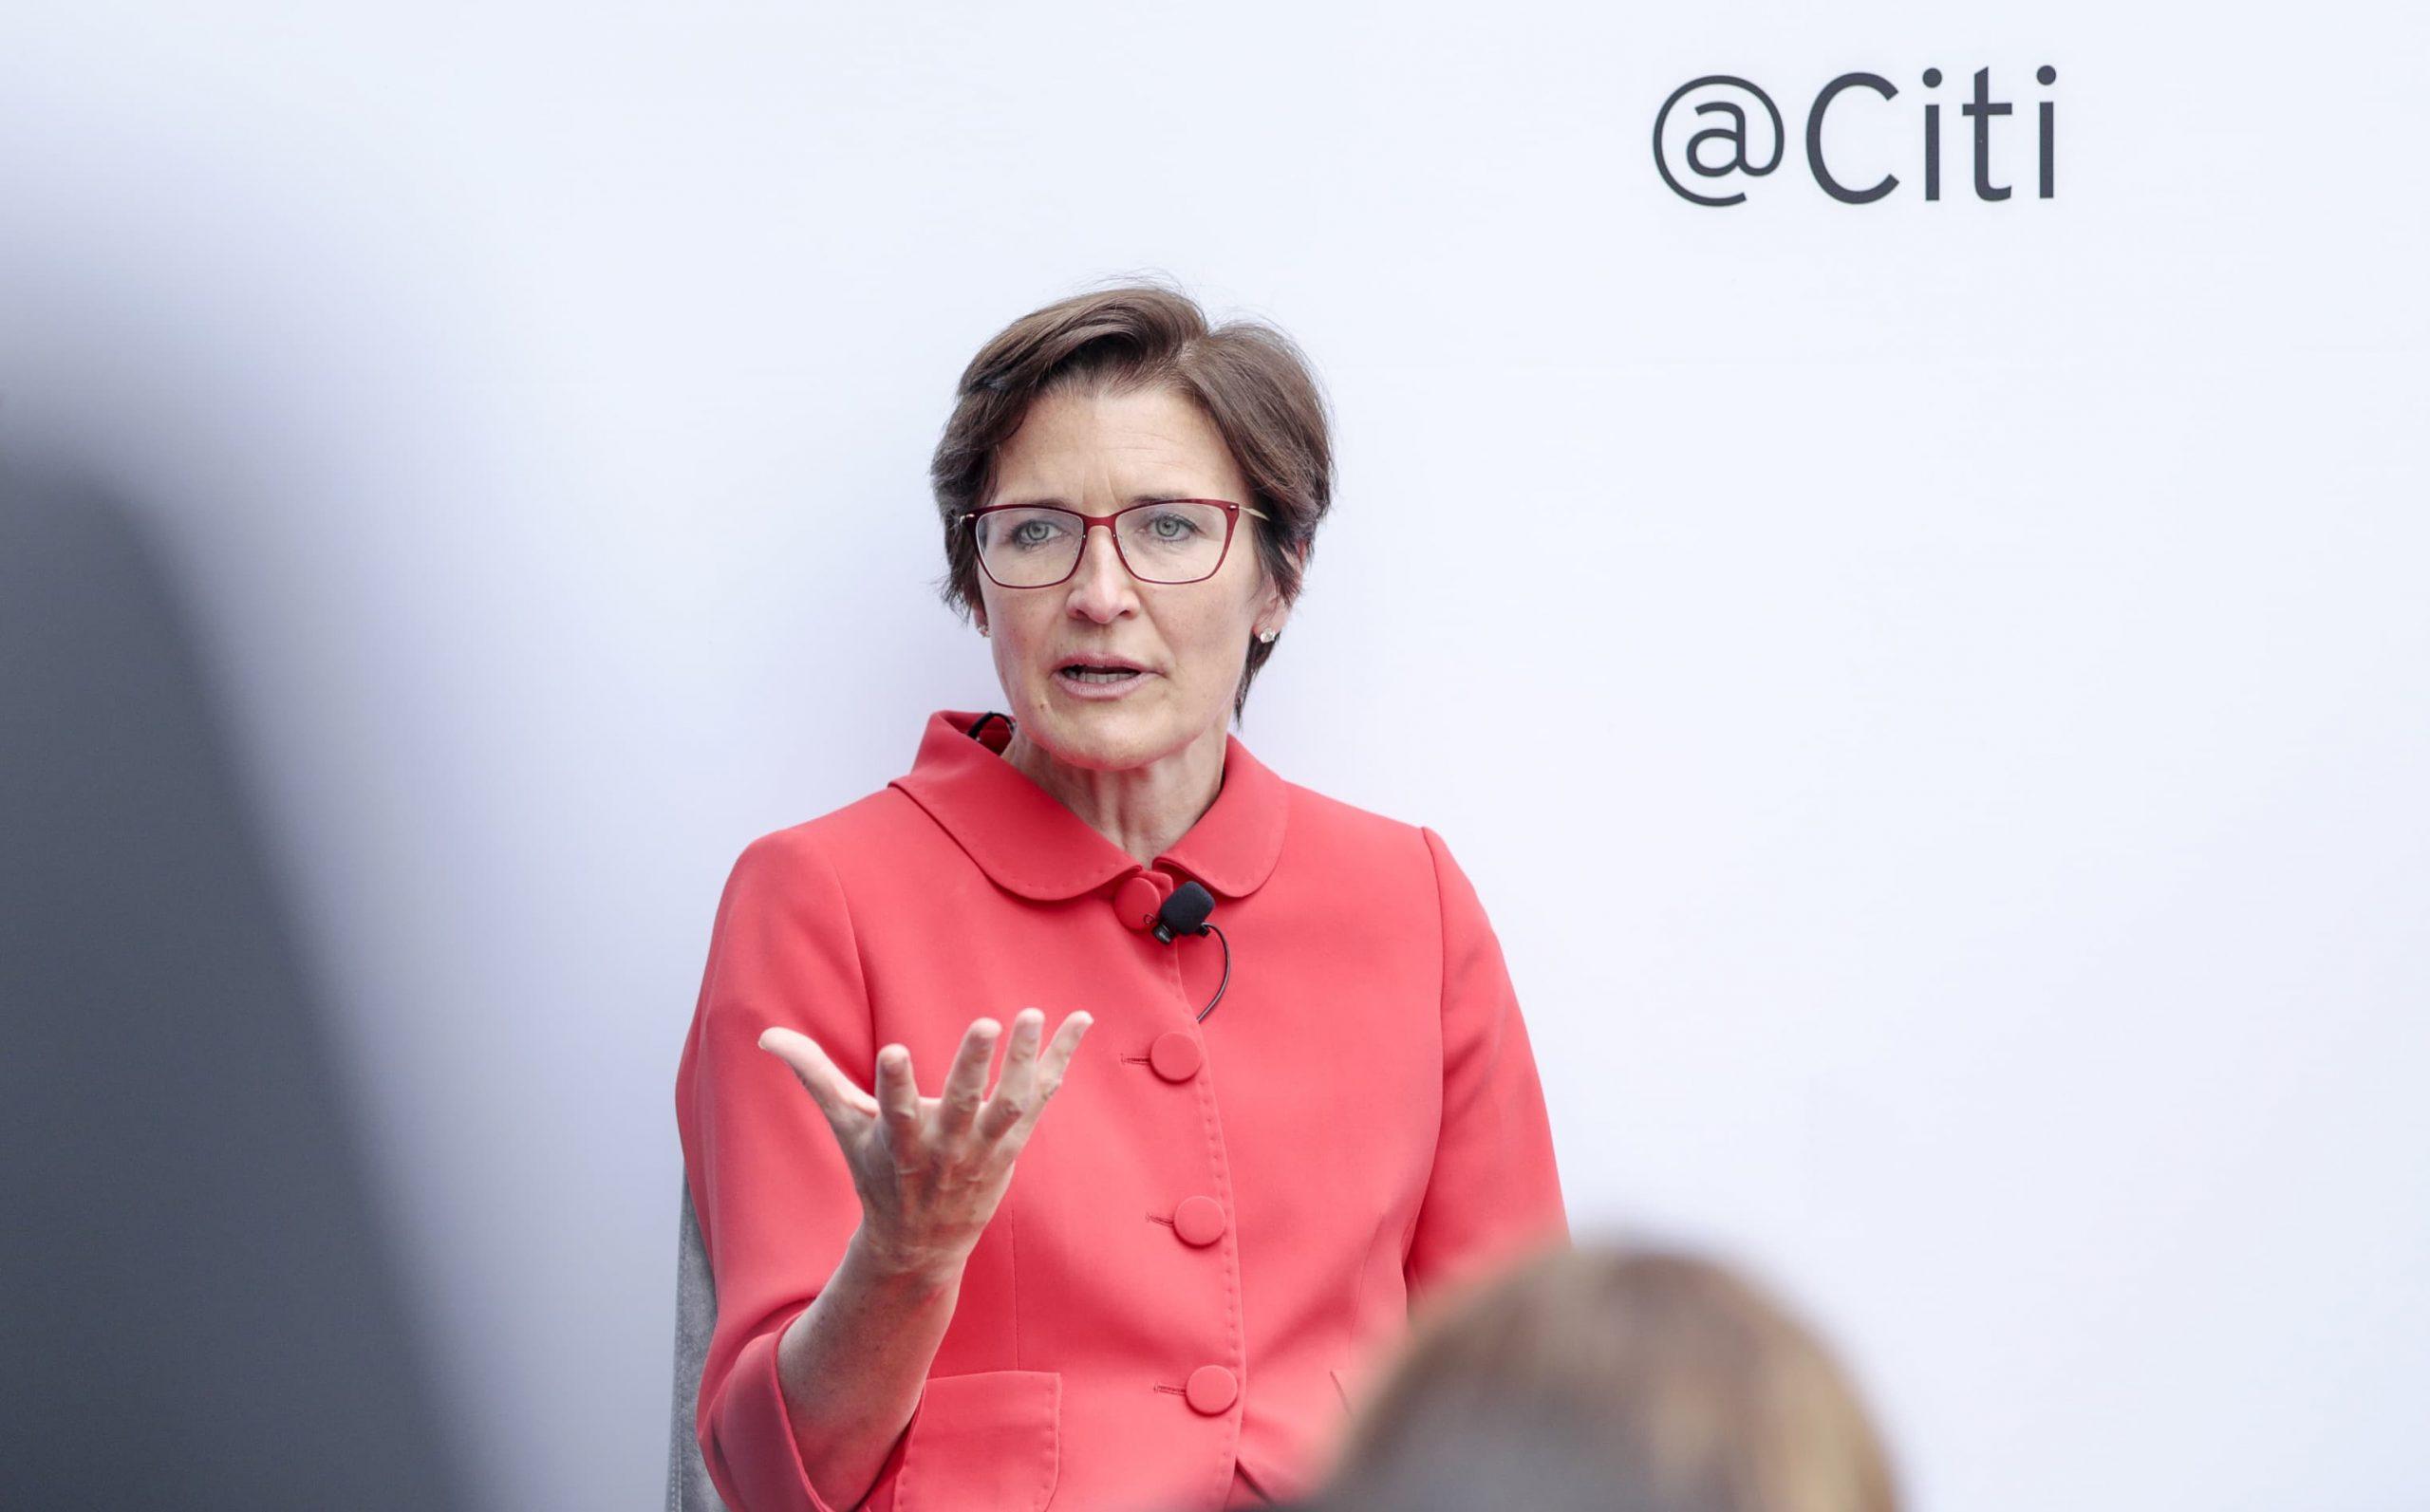 Citigroup (C) earnings 1Q 2021